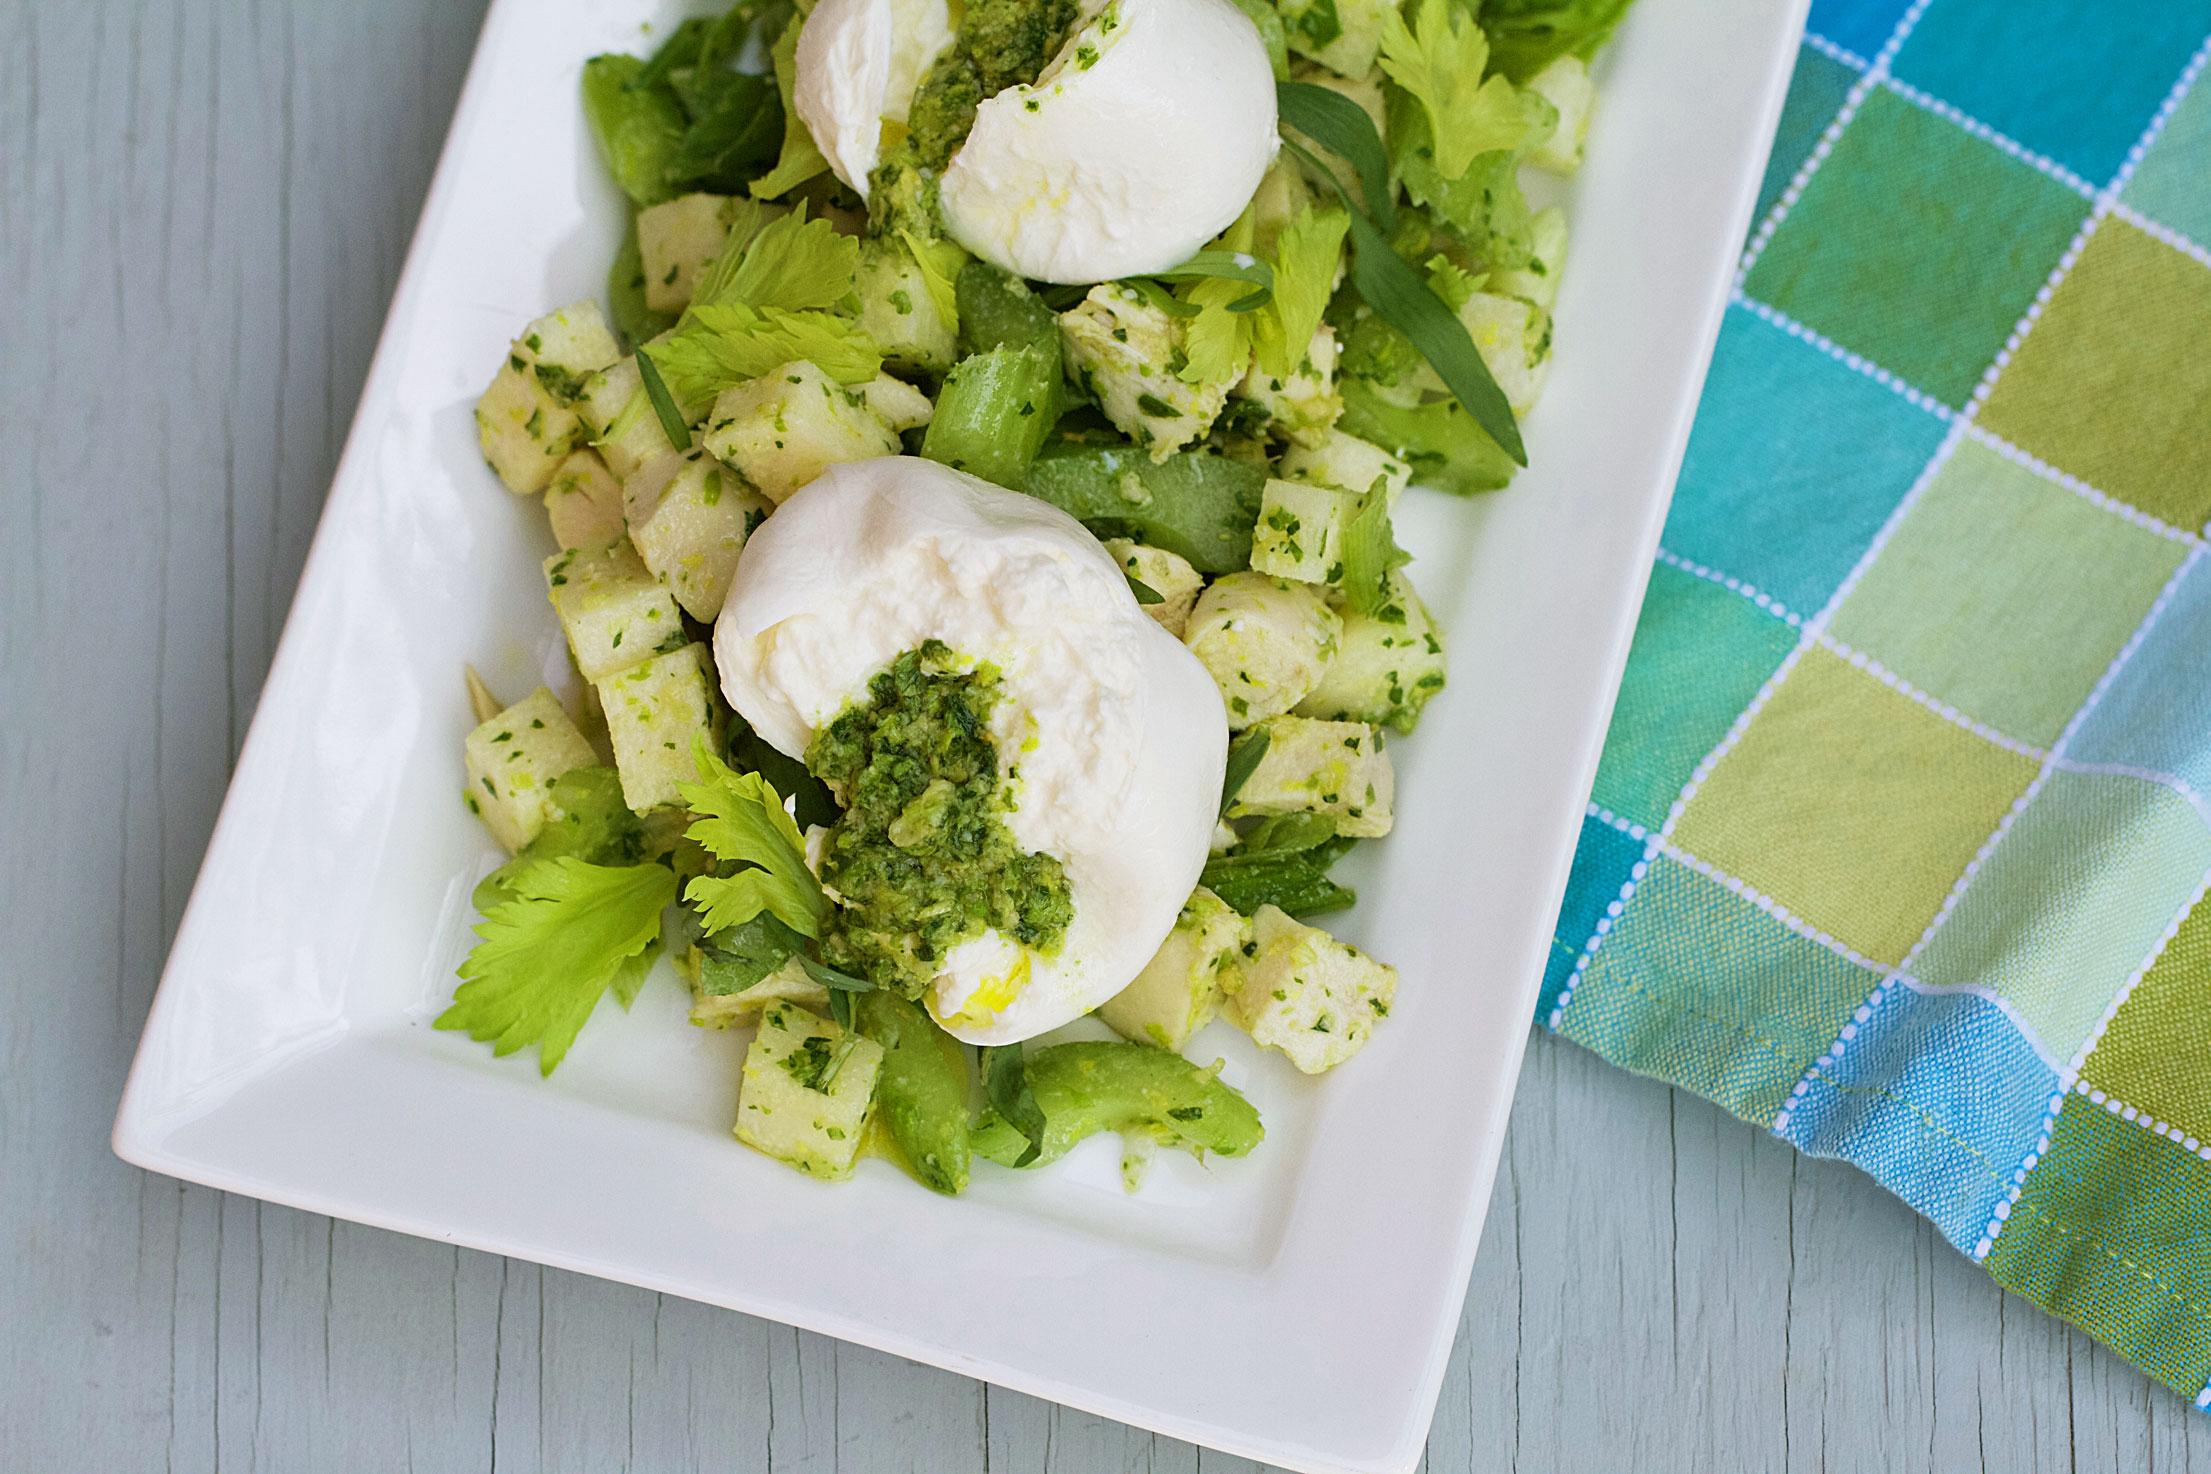 Chicken and Jicama Salad with Celery Leaf Pesto